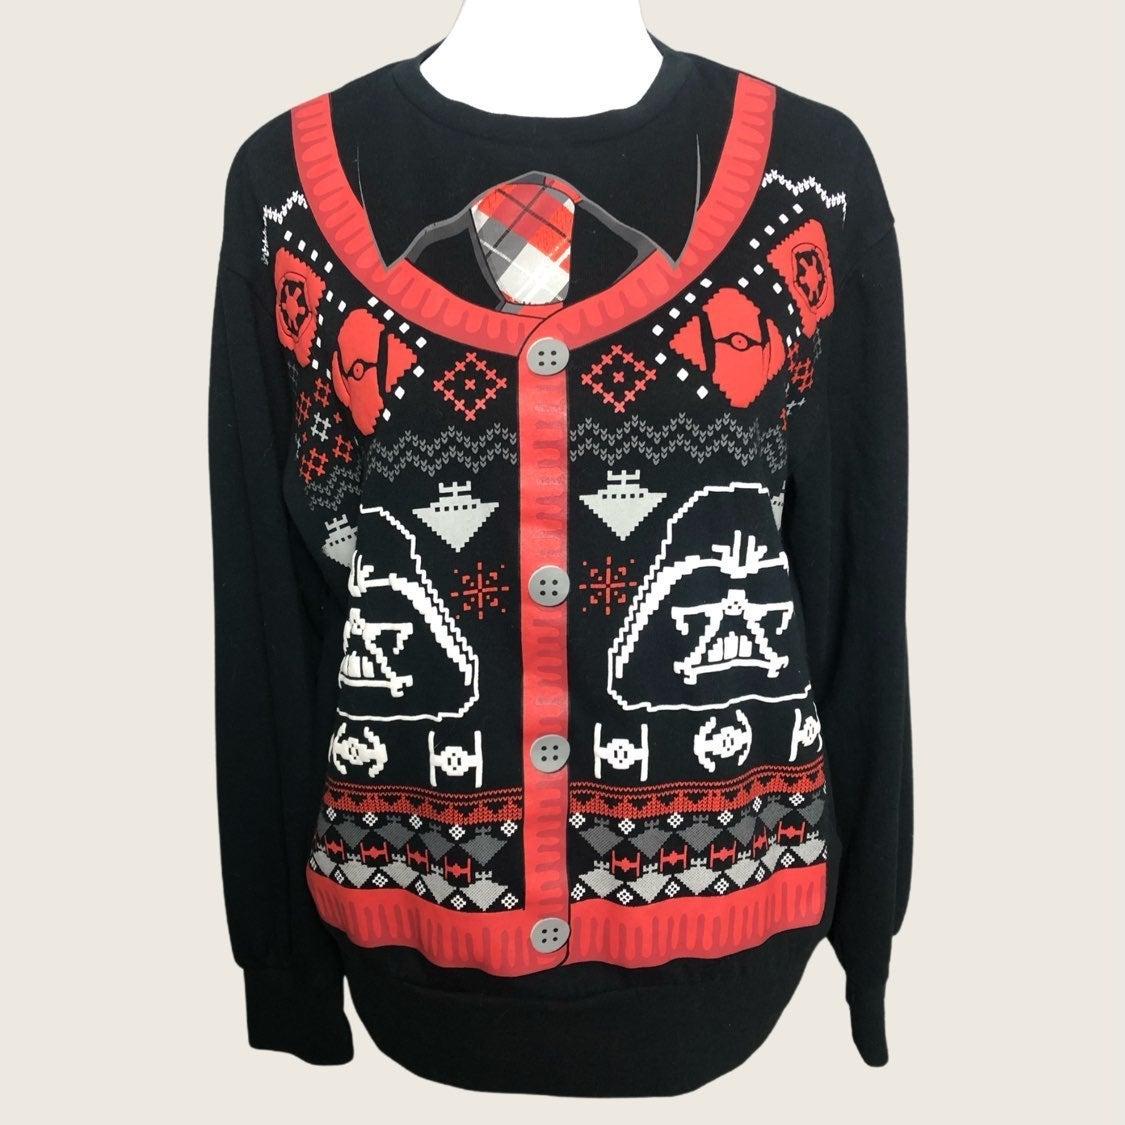 Darth Vader Christmas Sweatshirt